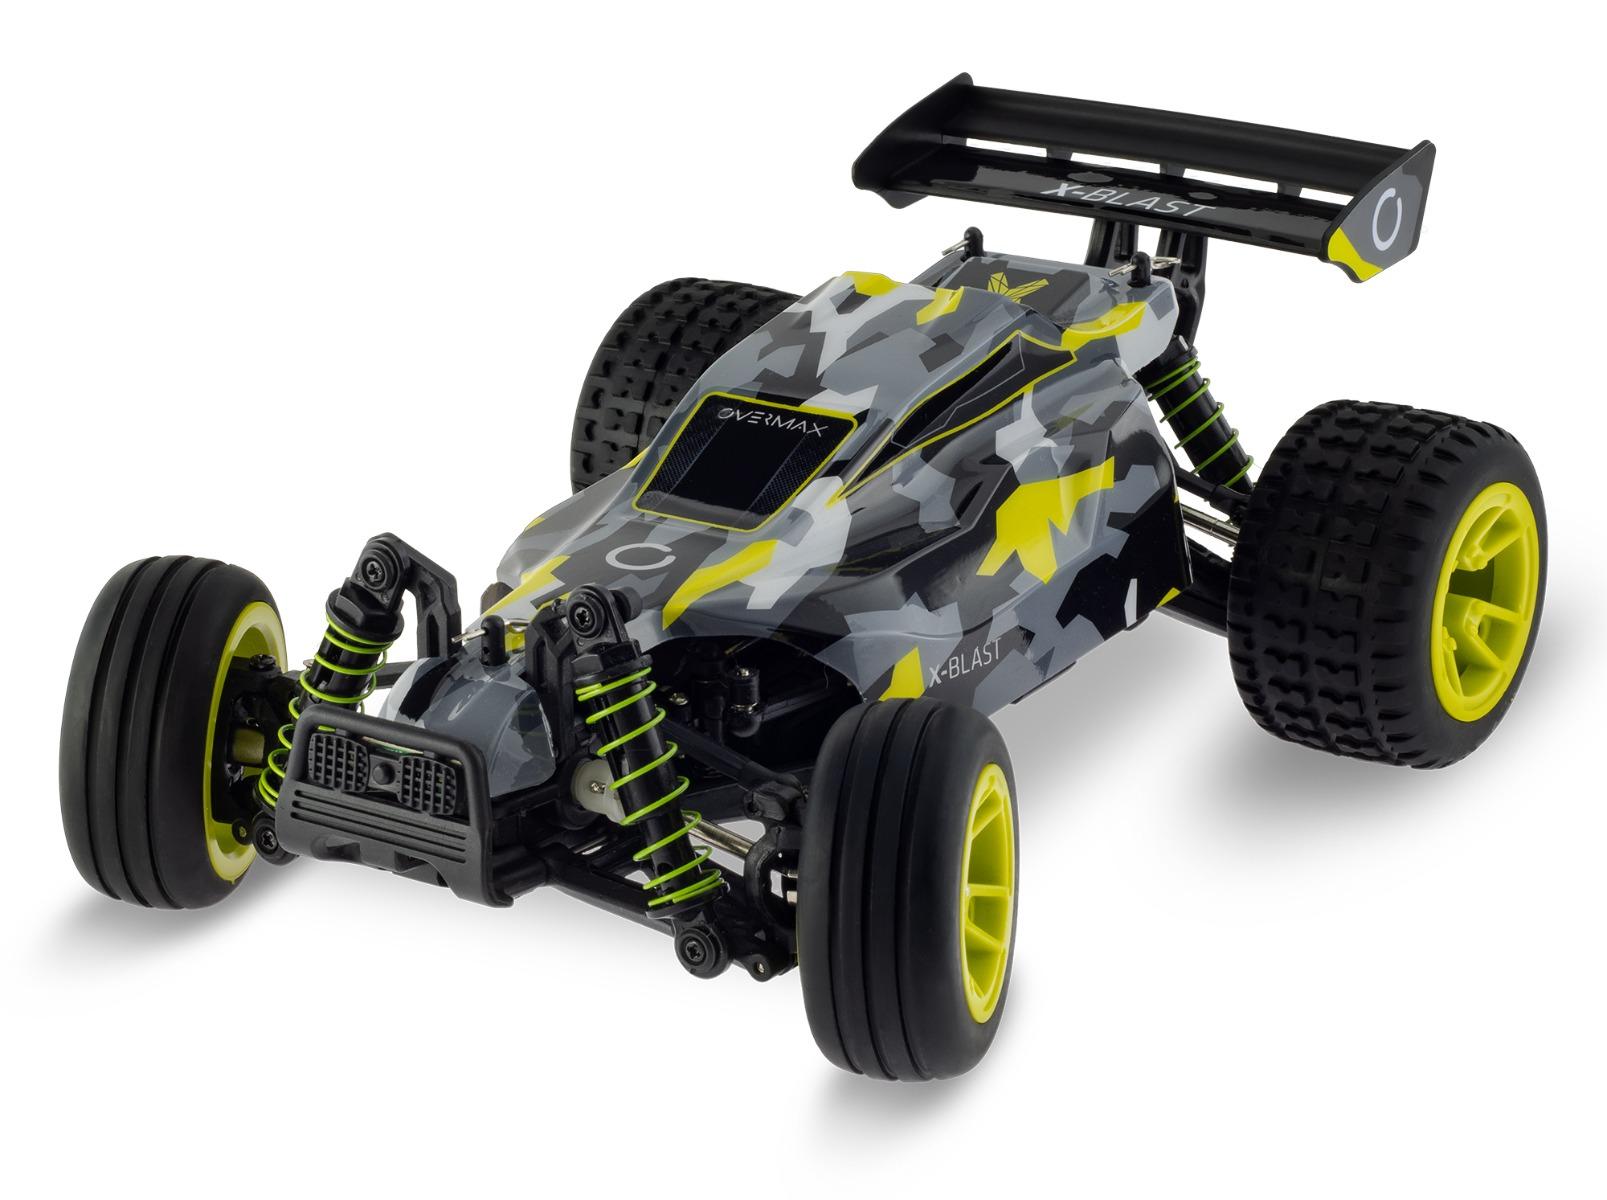 Samochód RC Overmax X-Monster 3.0